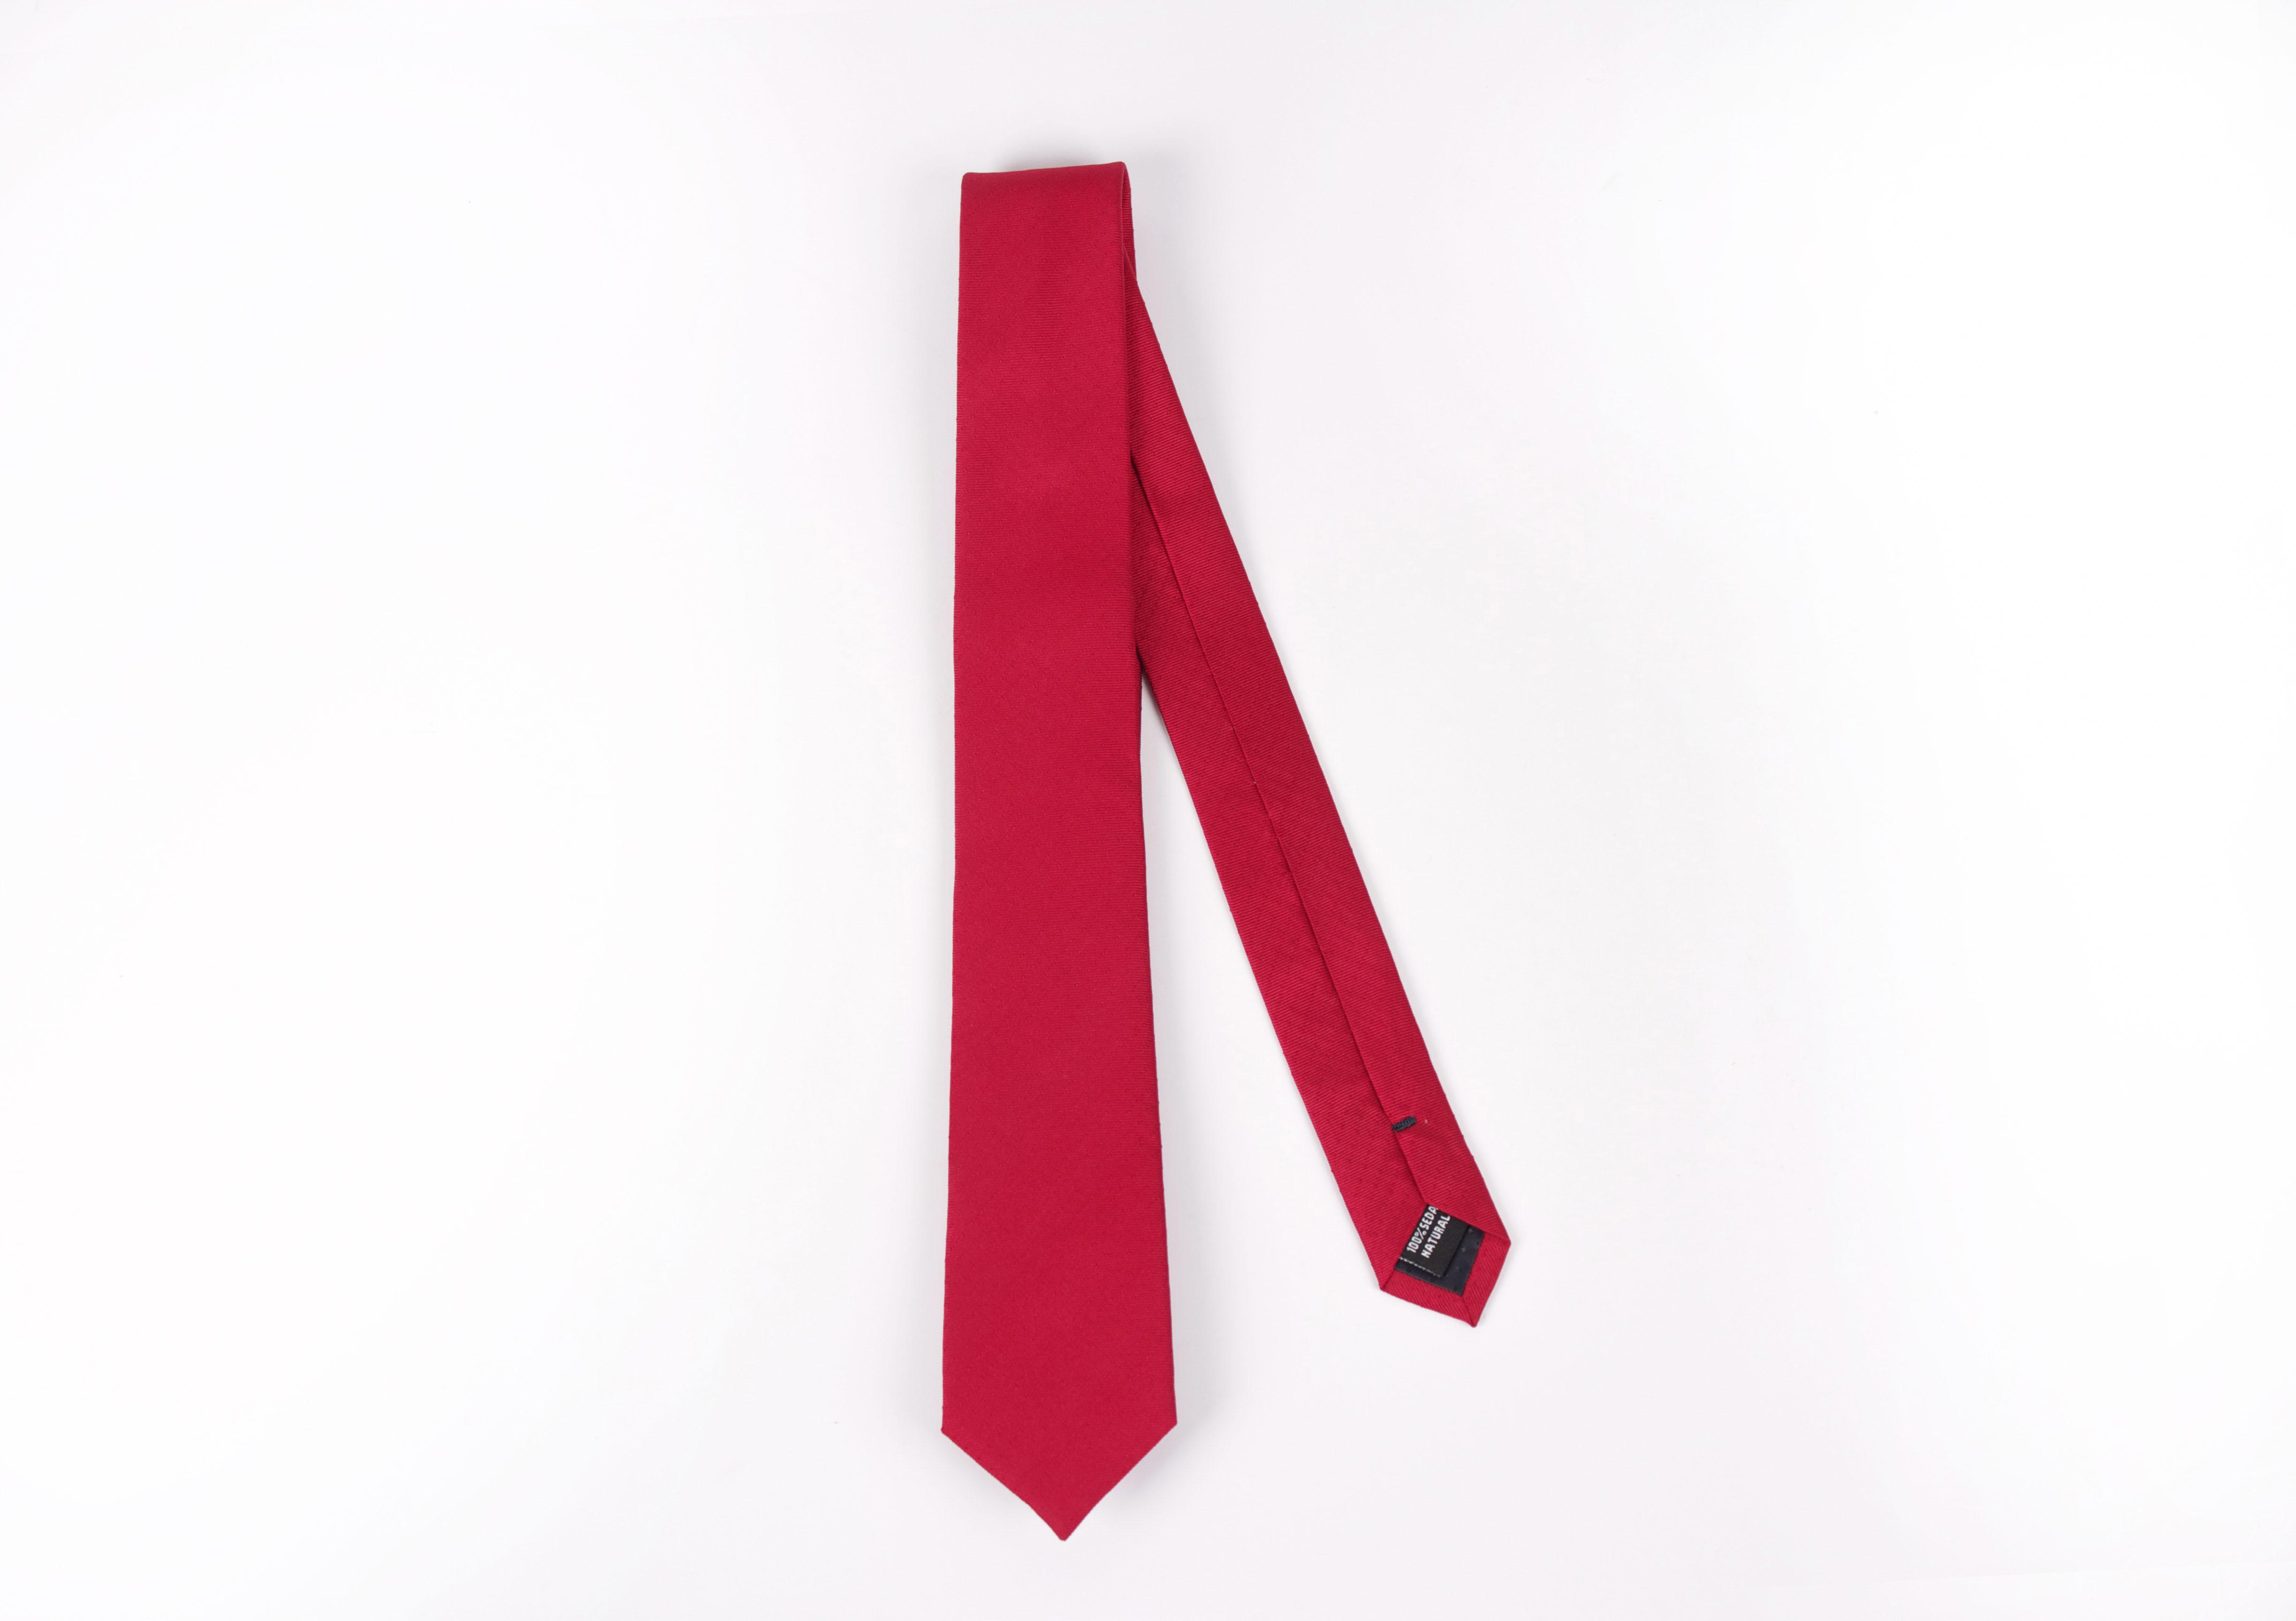 Corbata Rojo puntos rojos